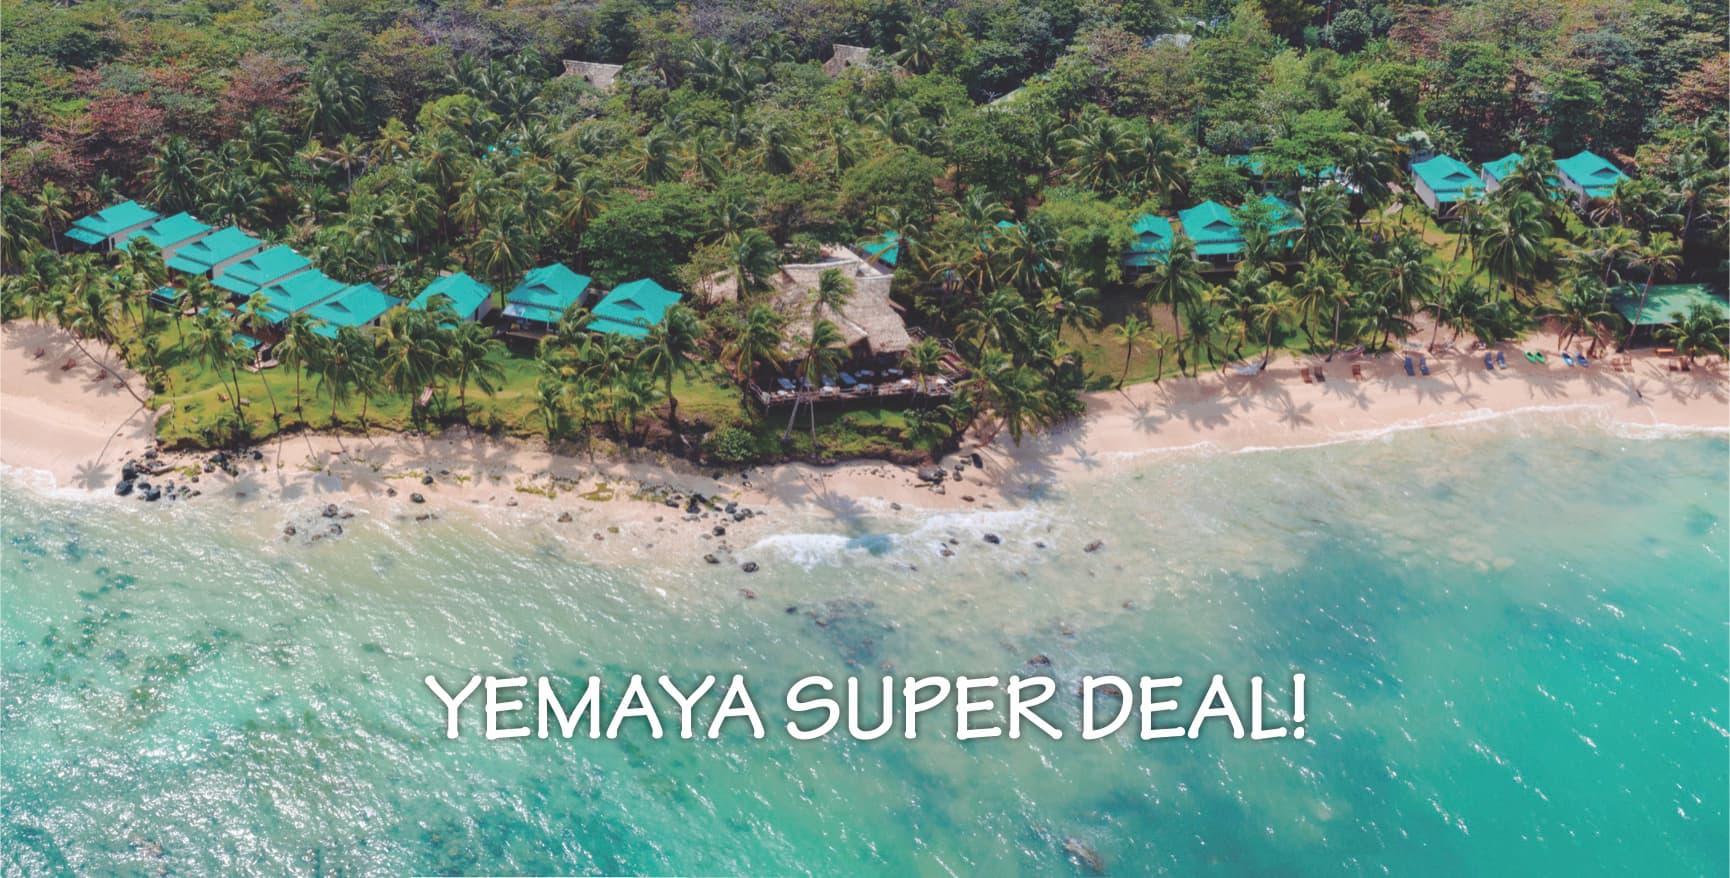 yemaya-deal-super